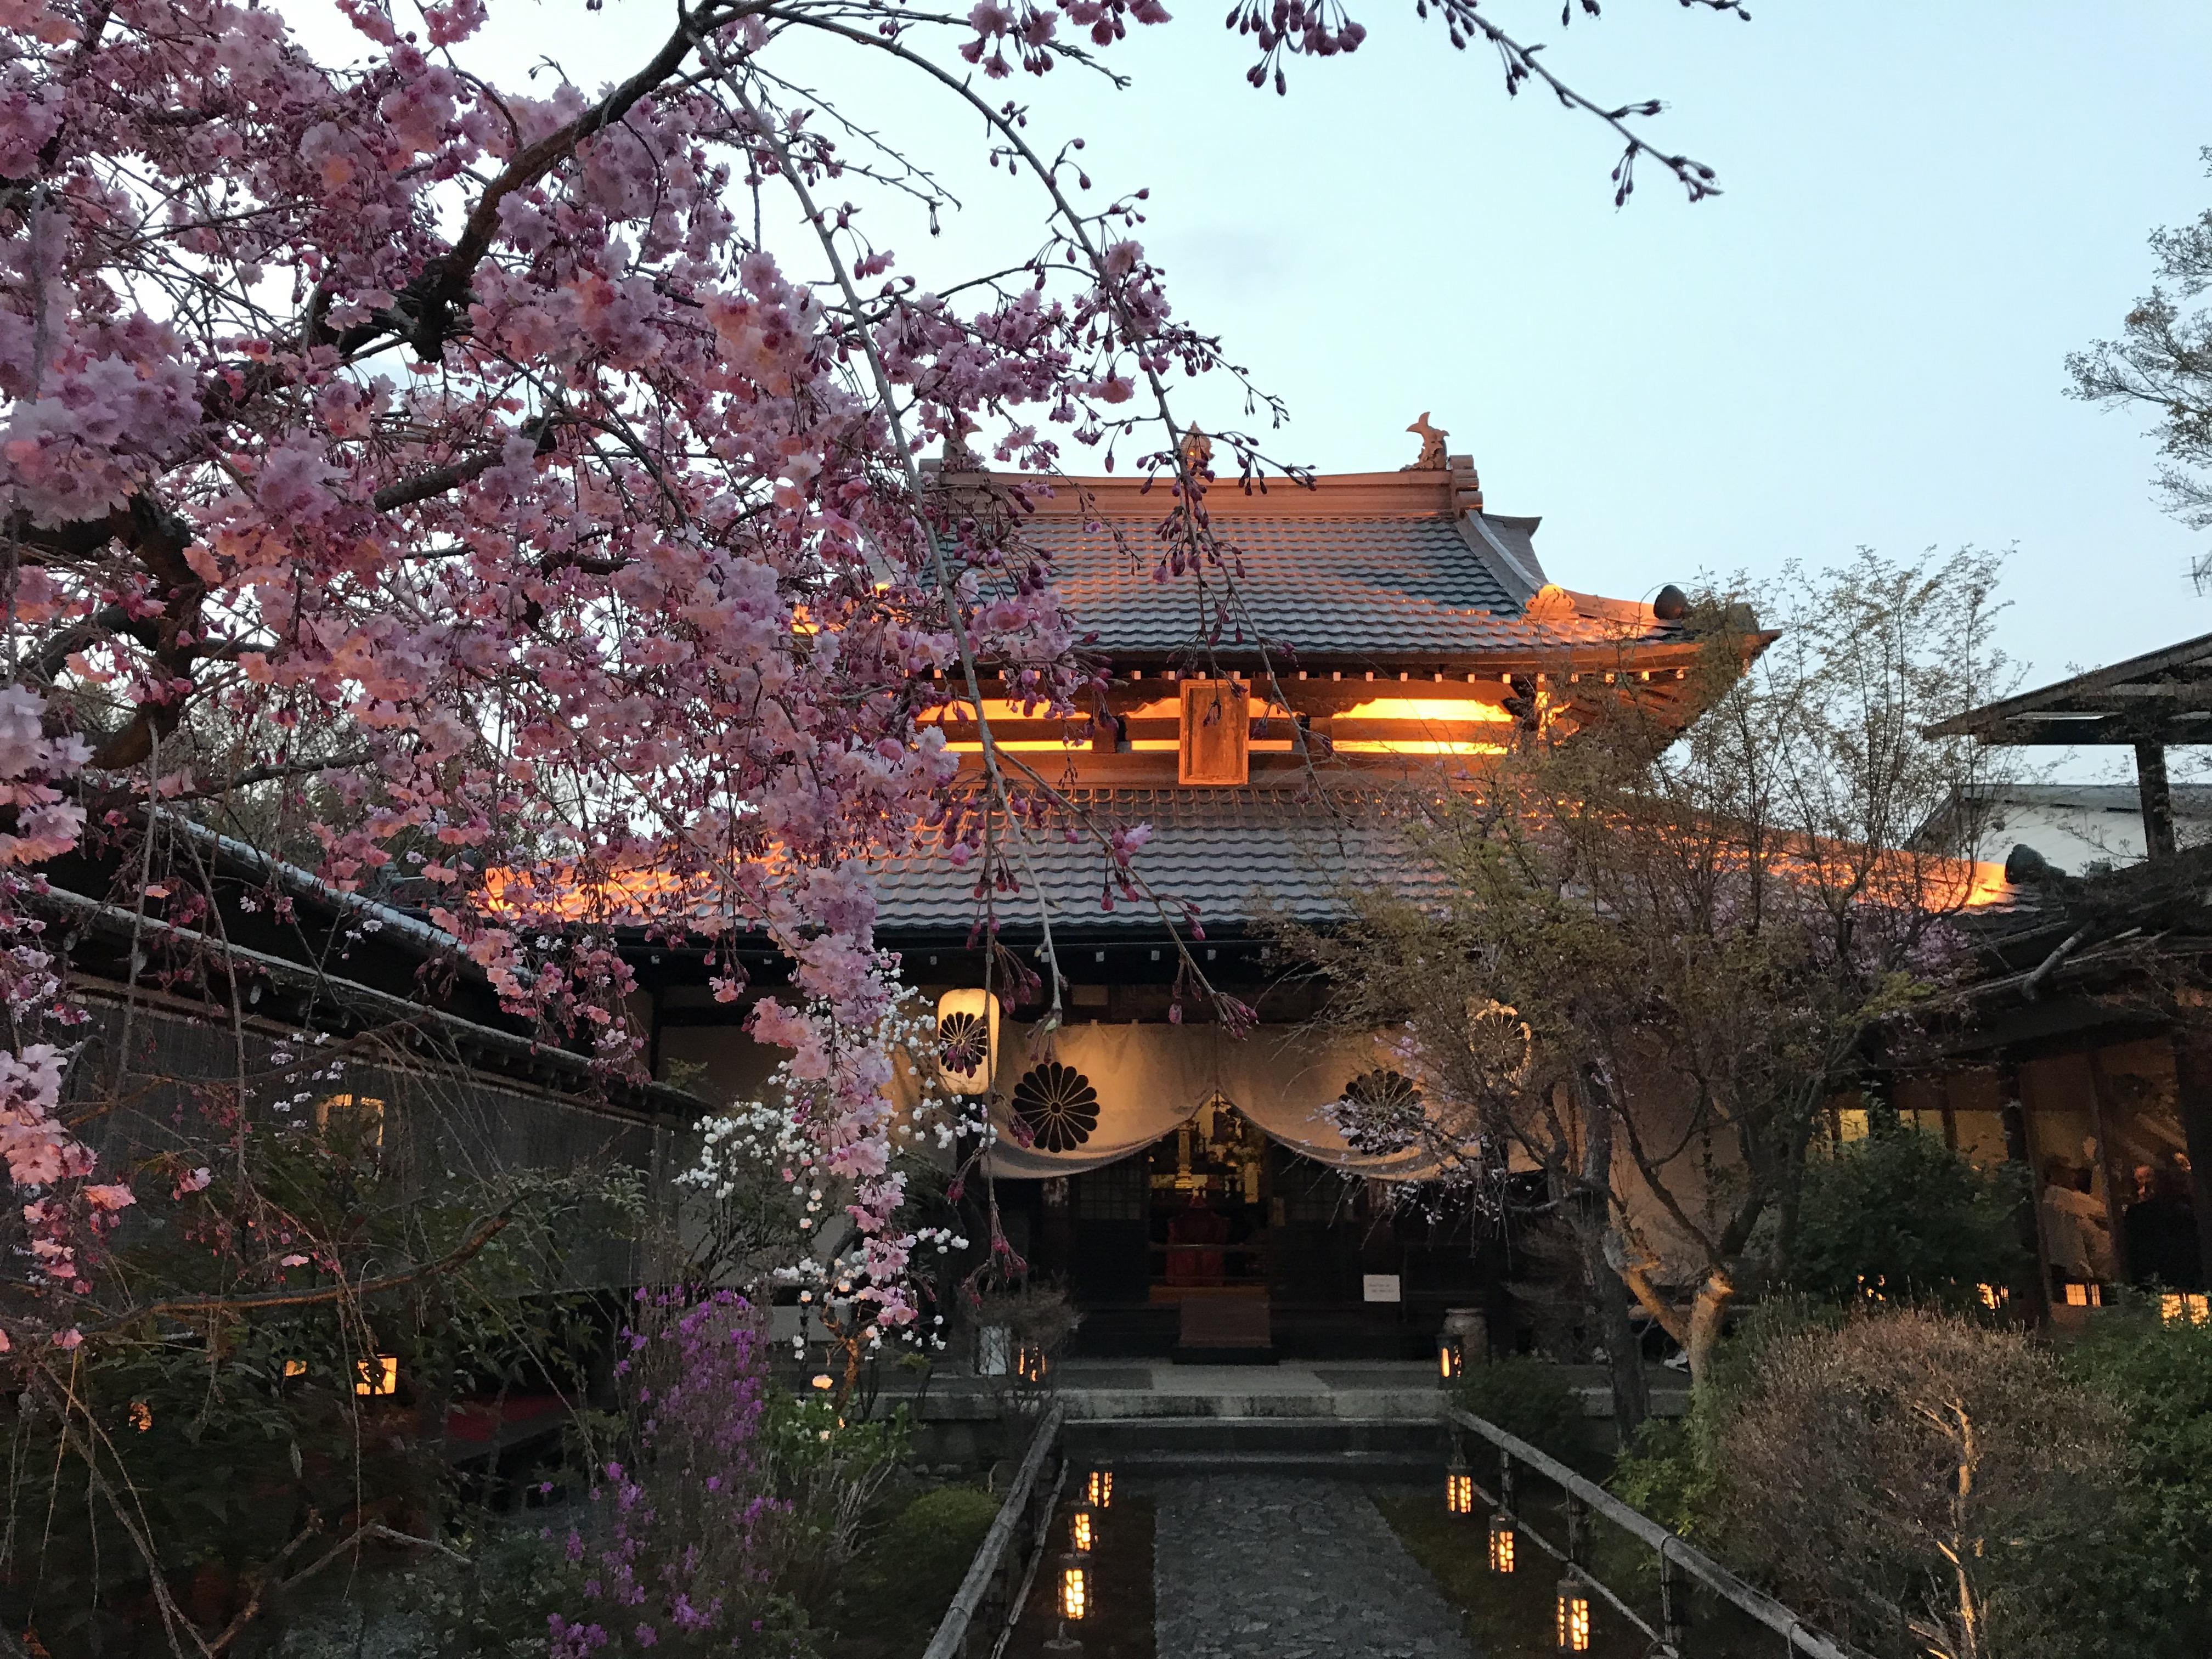 Tempelessen